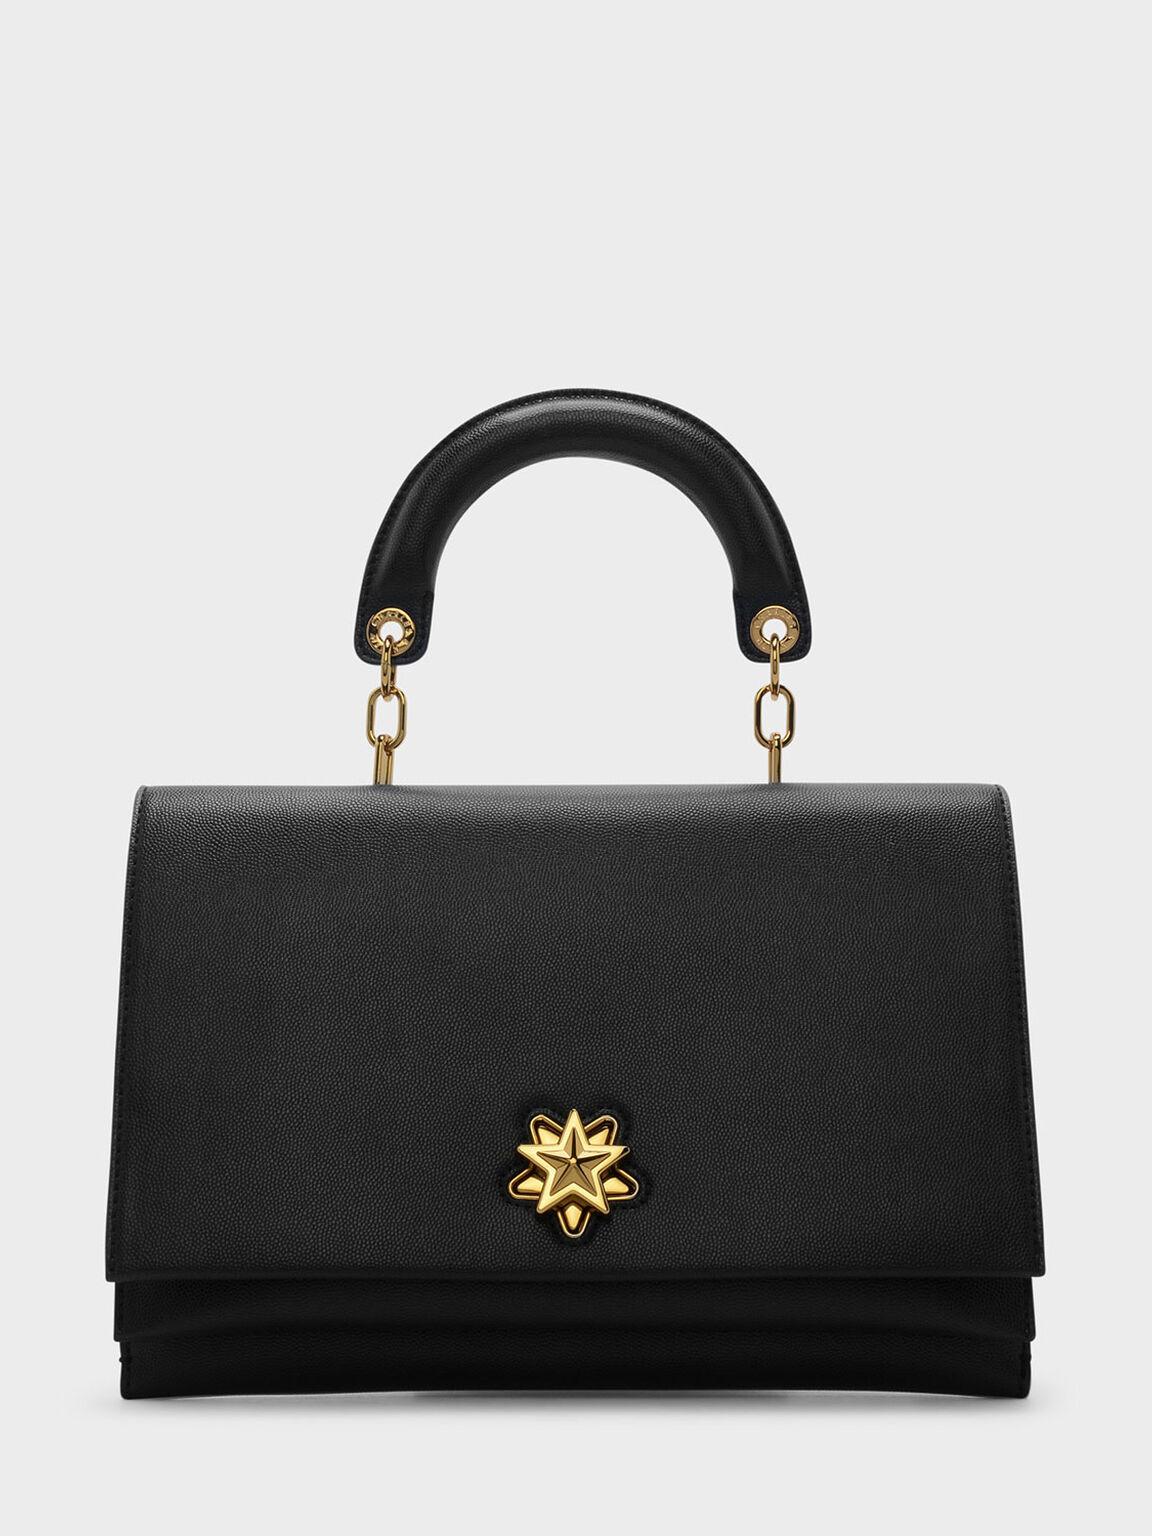 Star Detail Turn-Lock Crossbody Bag, Black, hi-res